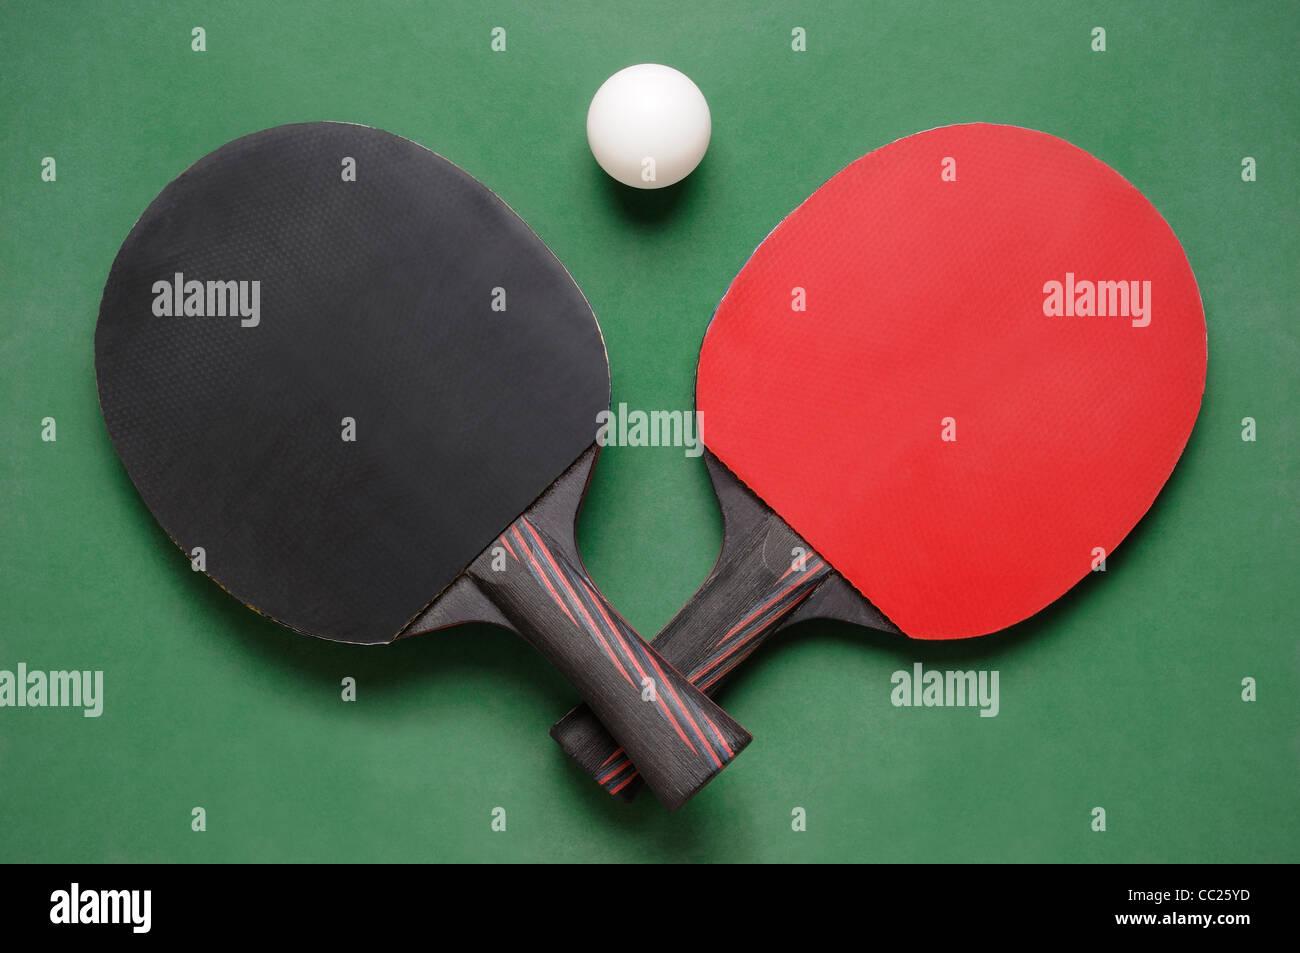 Paletas de Tenis de mesa Imagen De Stock